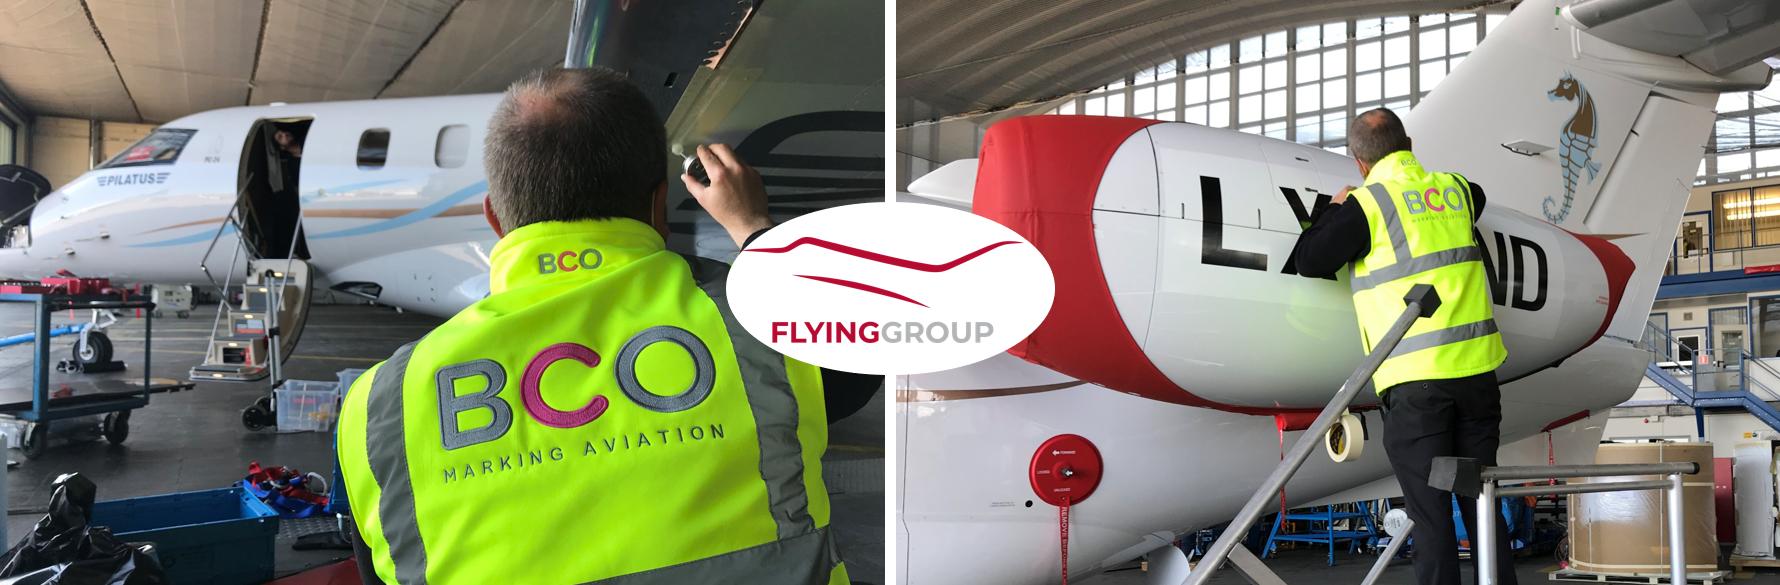 Illustration for: Business Jet registration decals for Flying Group (Pilatus PC-24)